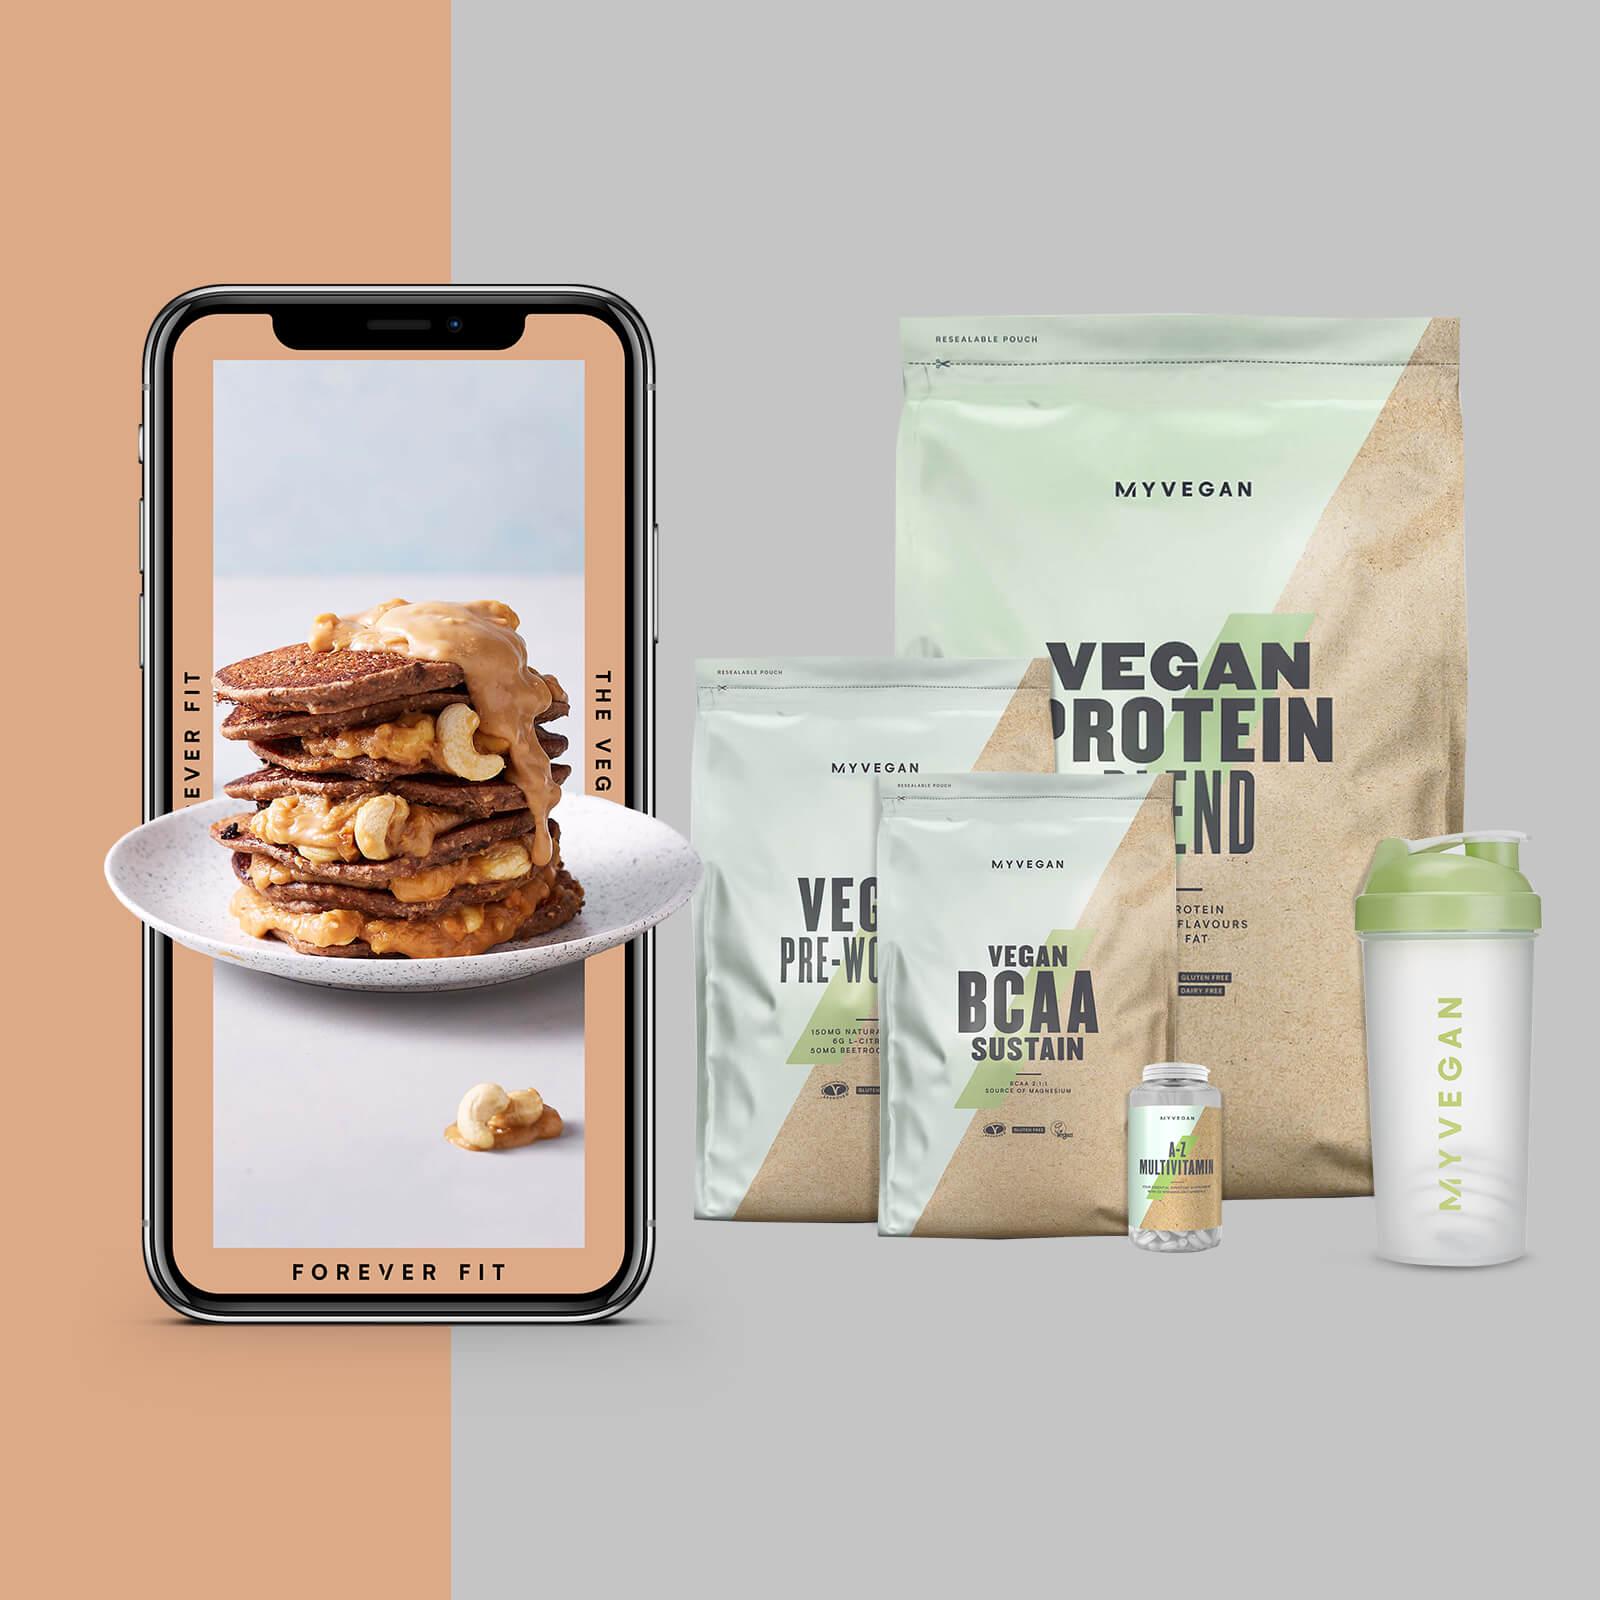 Le Pack Vegan + Guide Entraînement et Nutrition Offert - Orange - Lemon Tea - Unflavoured